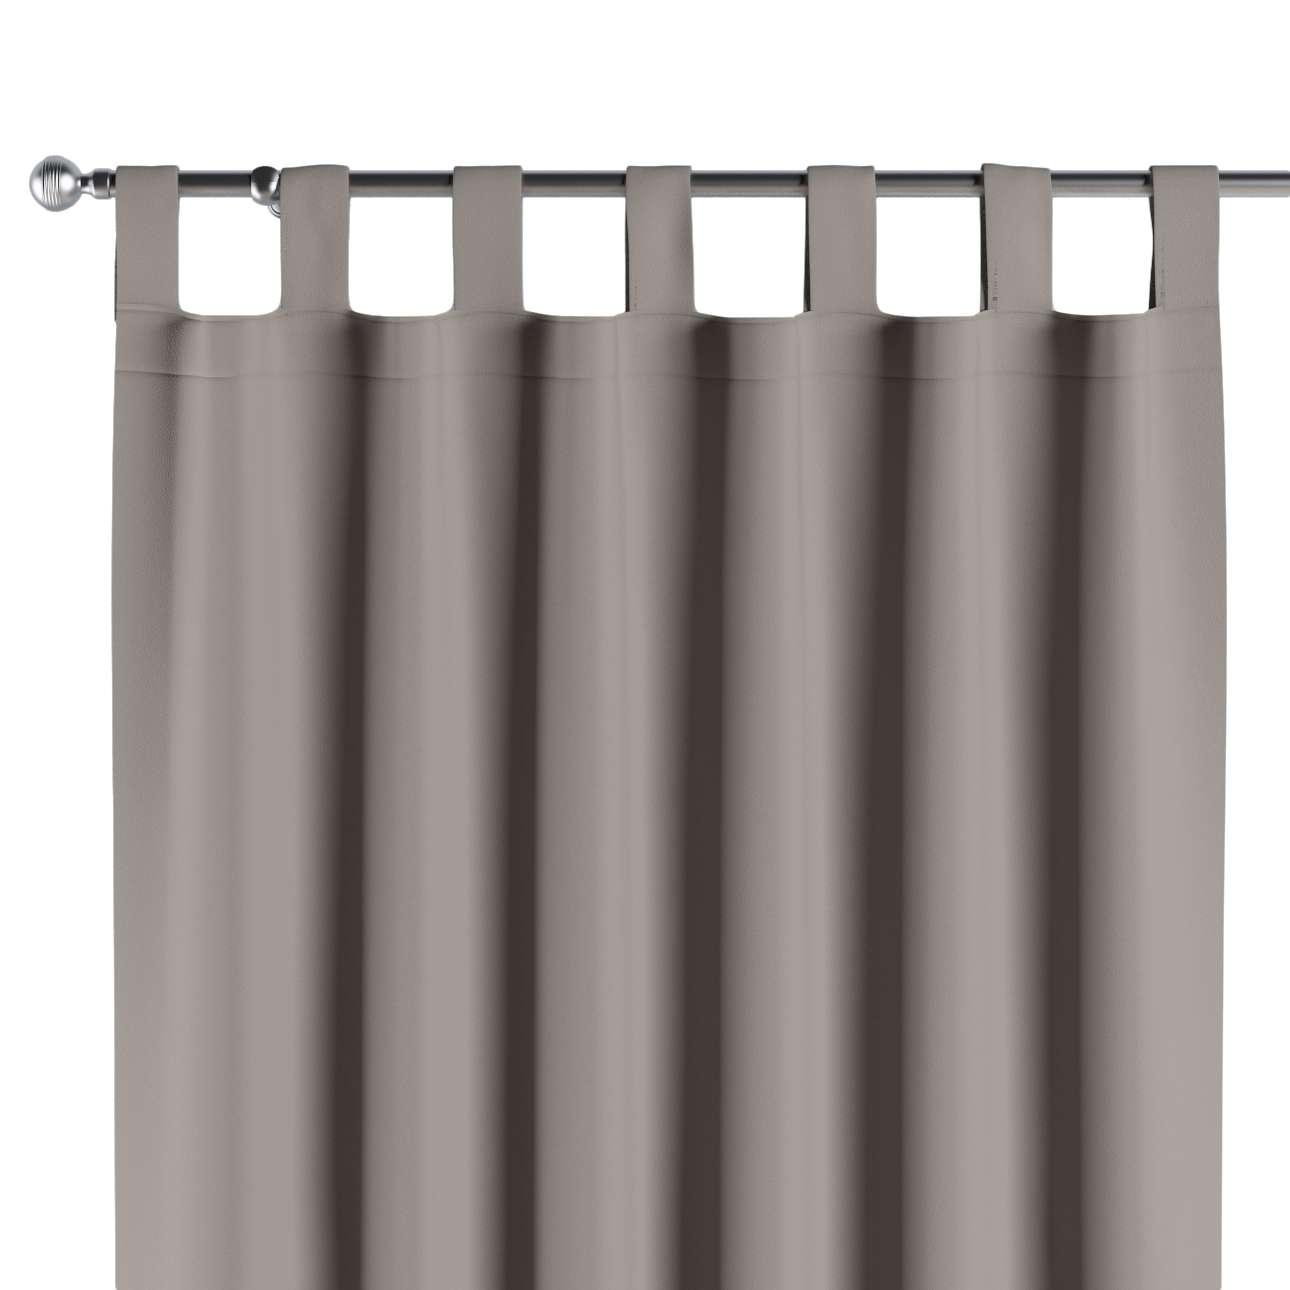 Blackout tab top curtains, light brown, 140 x 260 cm (55 x 102 ...